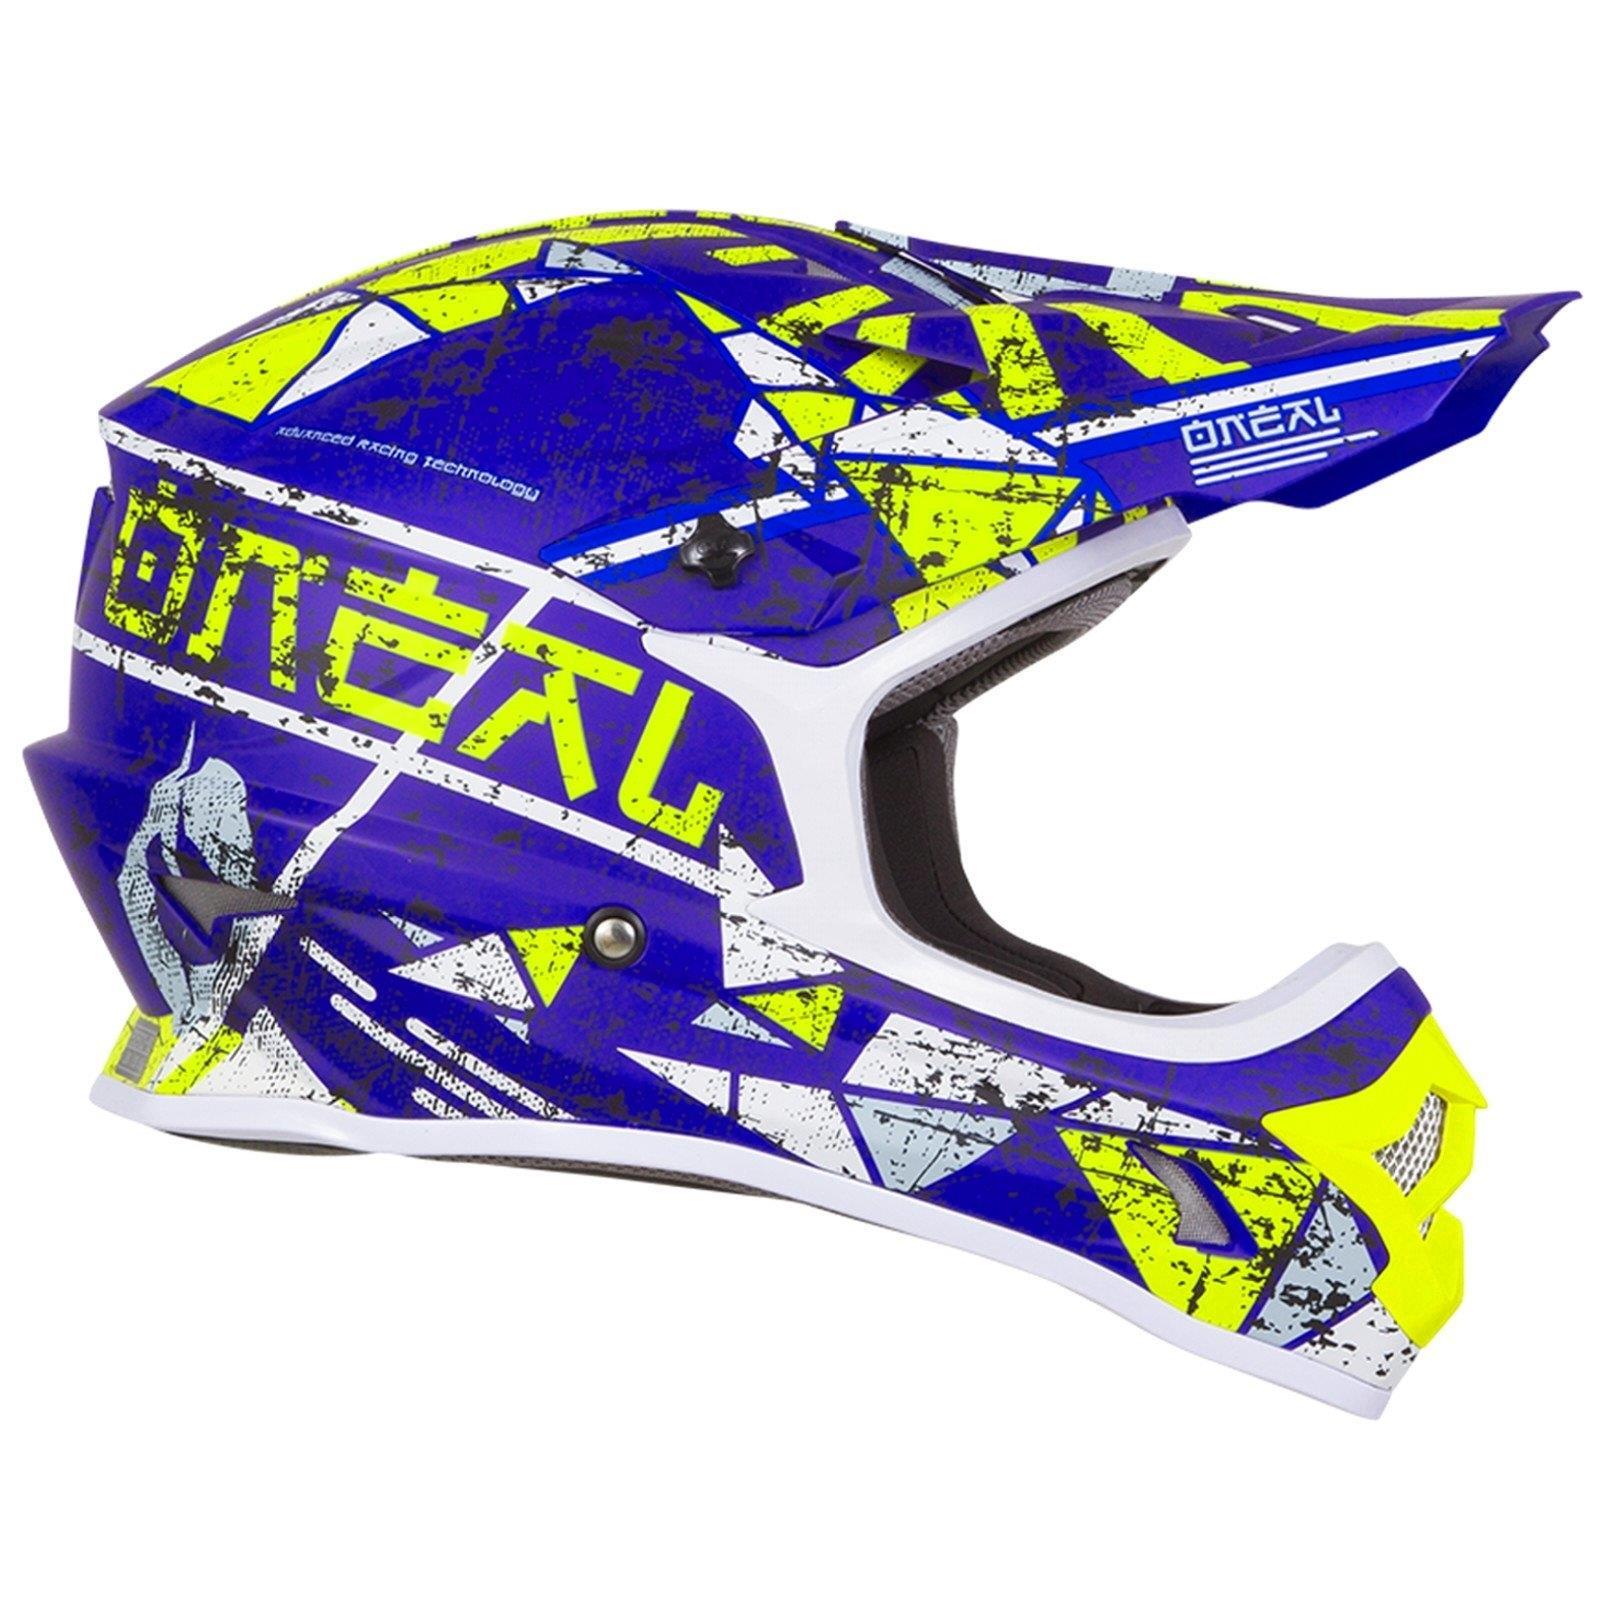 ONeal-Motocross-casco-MX-ENDURO-MOTO-BICI-FUORISTRADA-CROSS-Series-Adventure miniatura 25